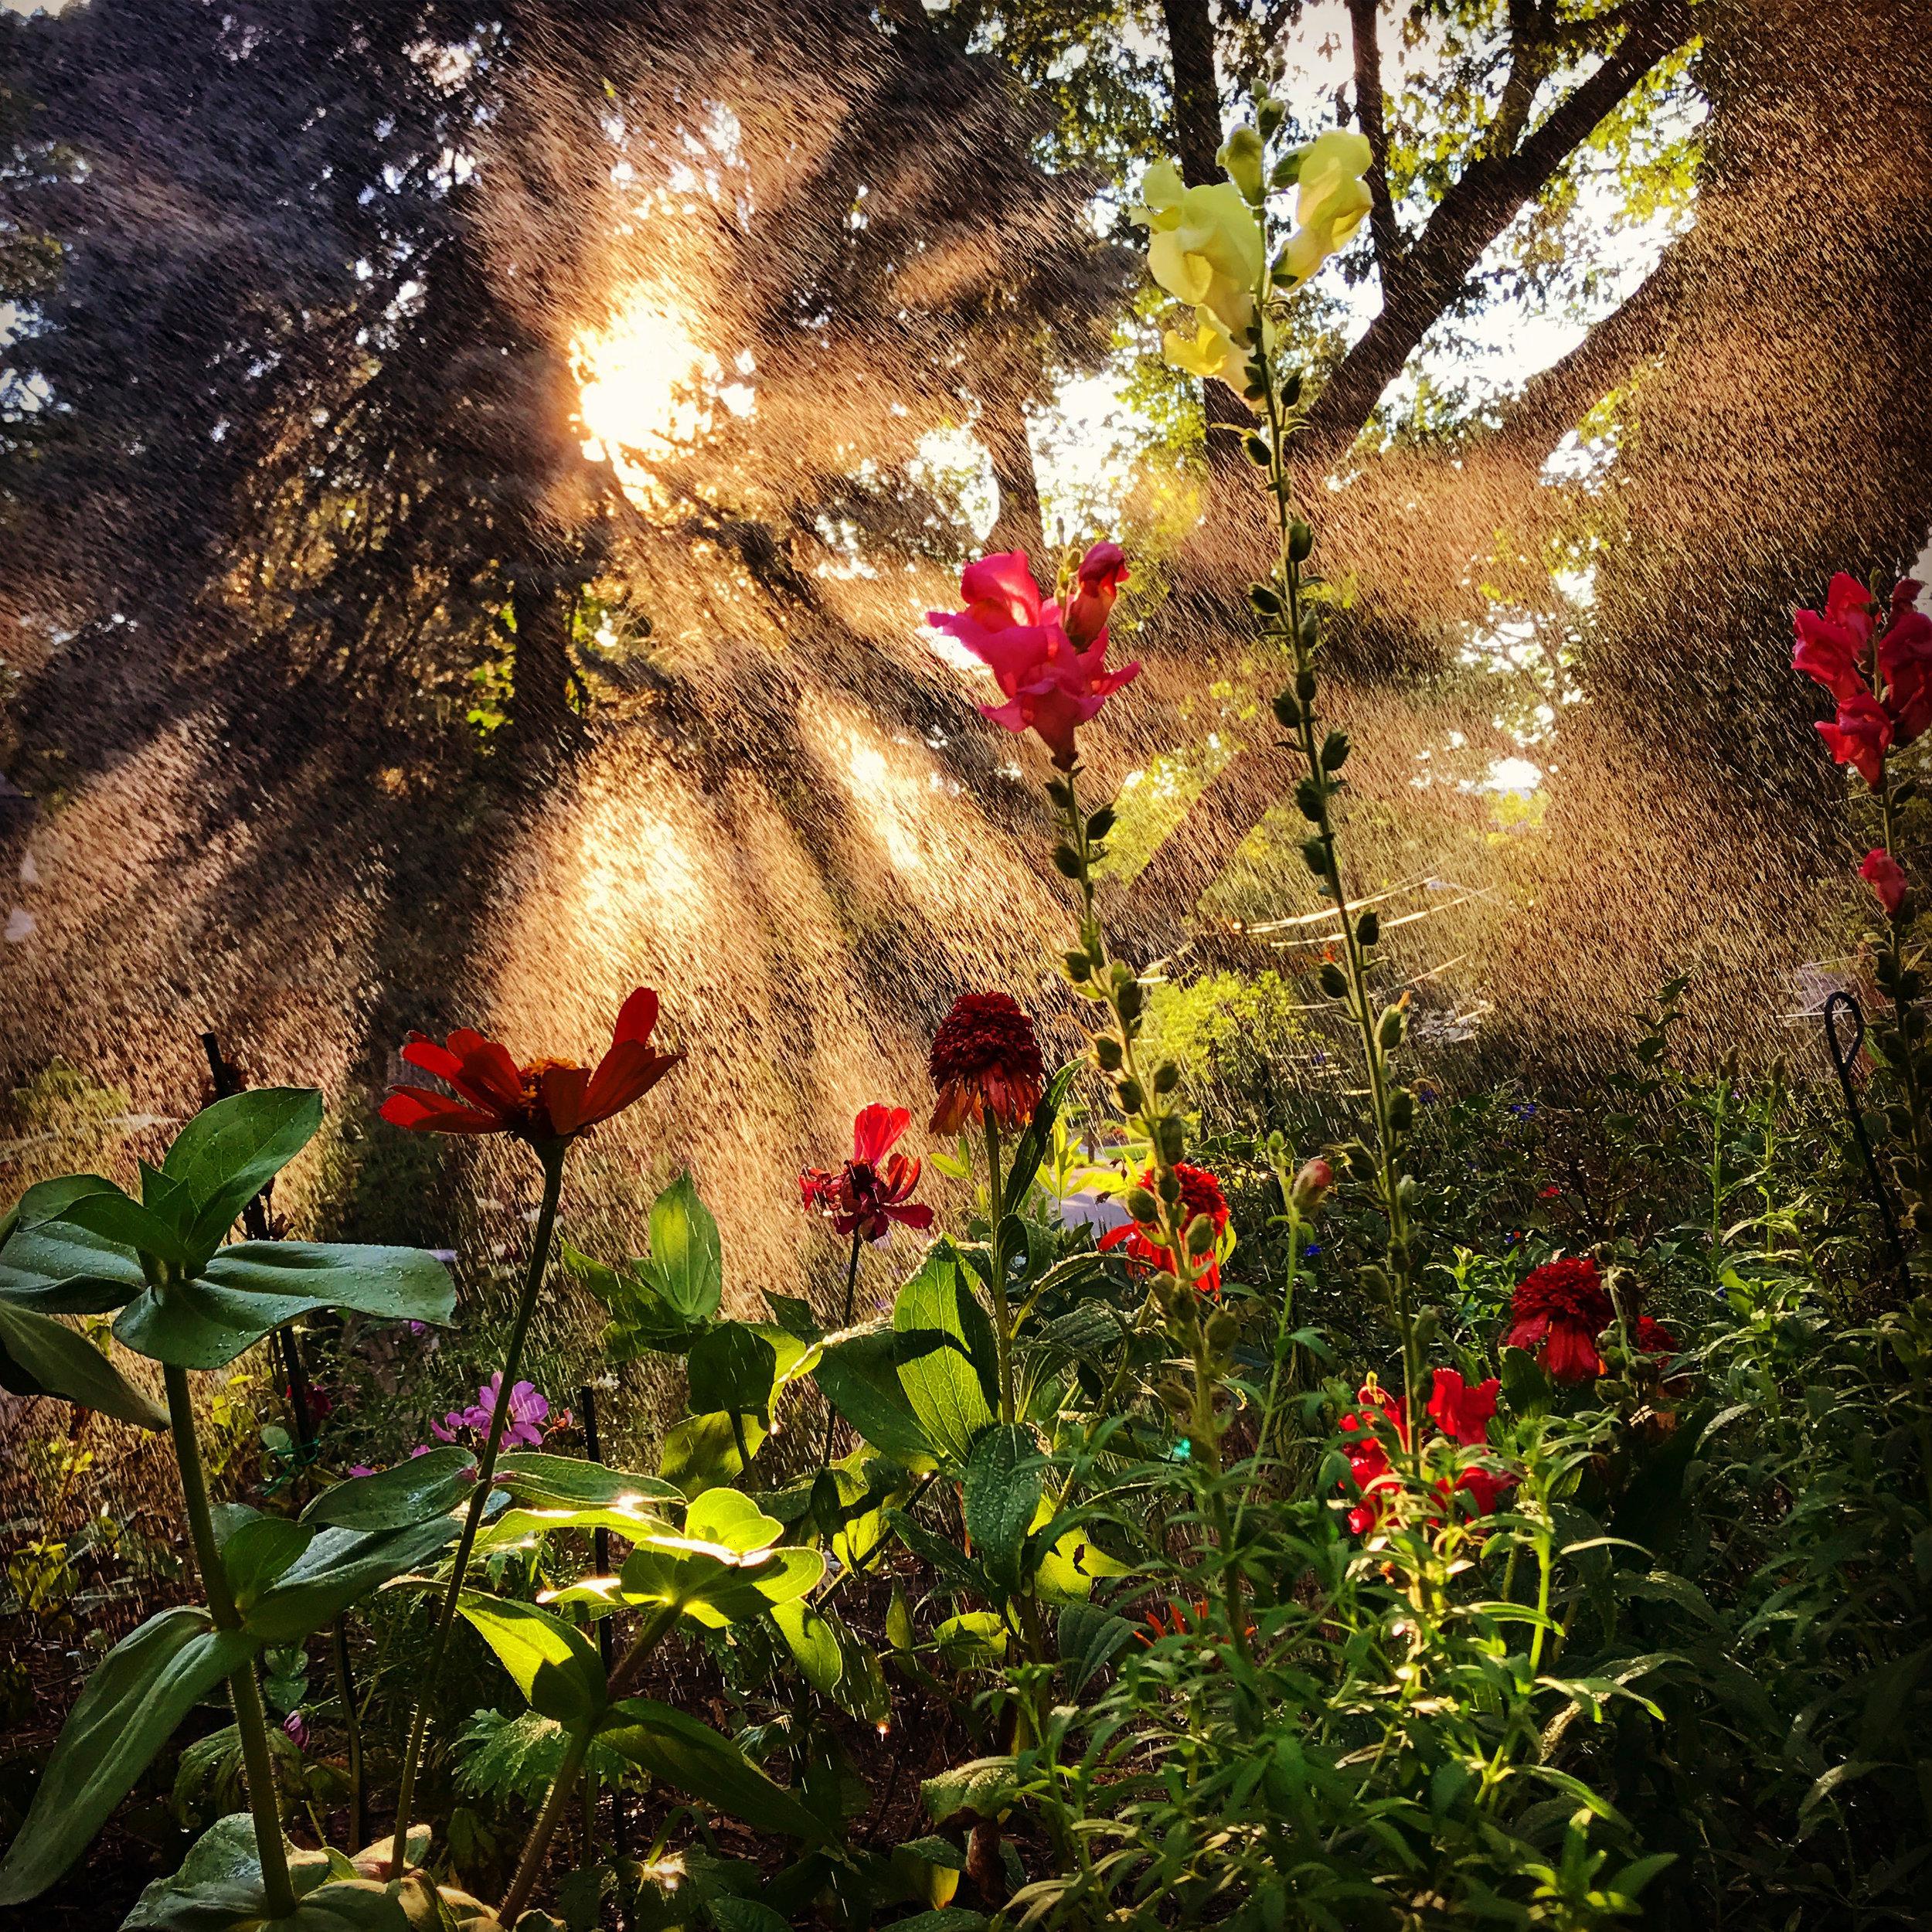 IMG_9633 magic garden sunrays lisa  rayman goldfarb.jpg